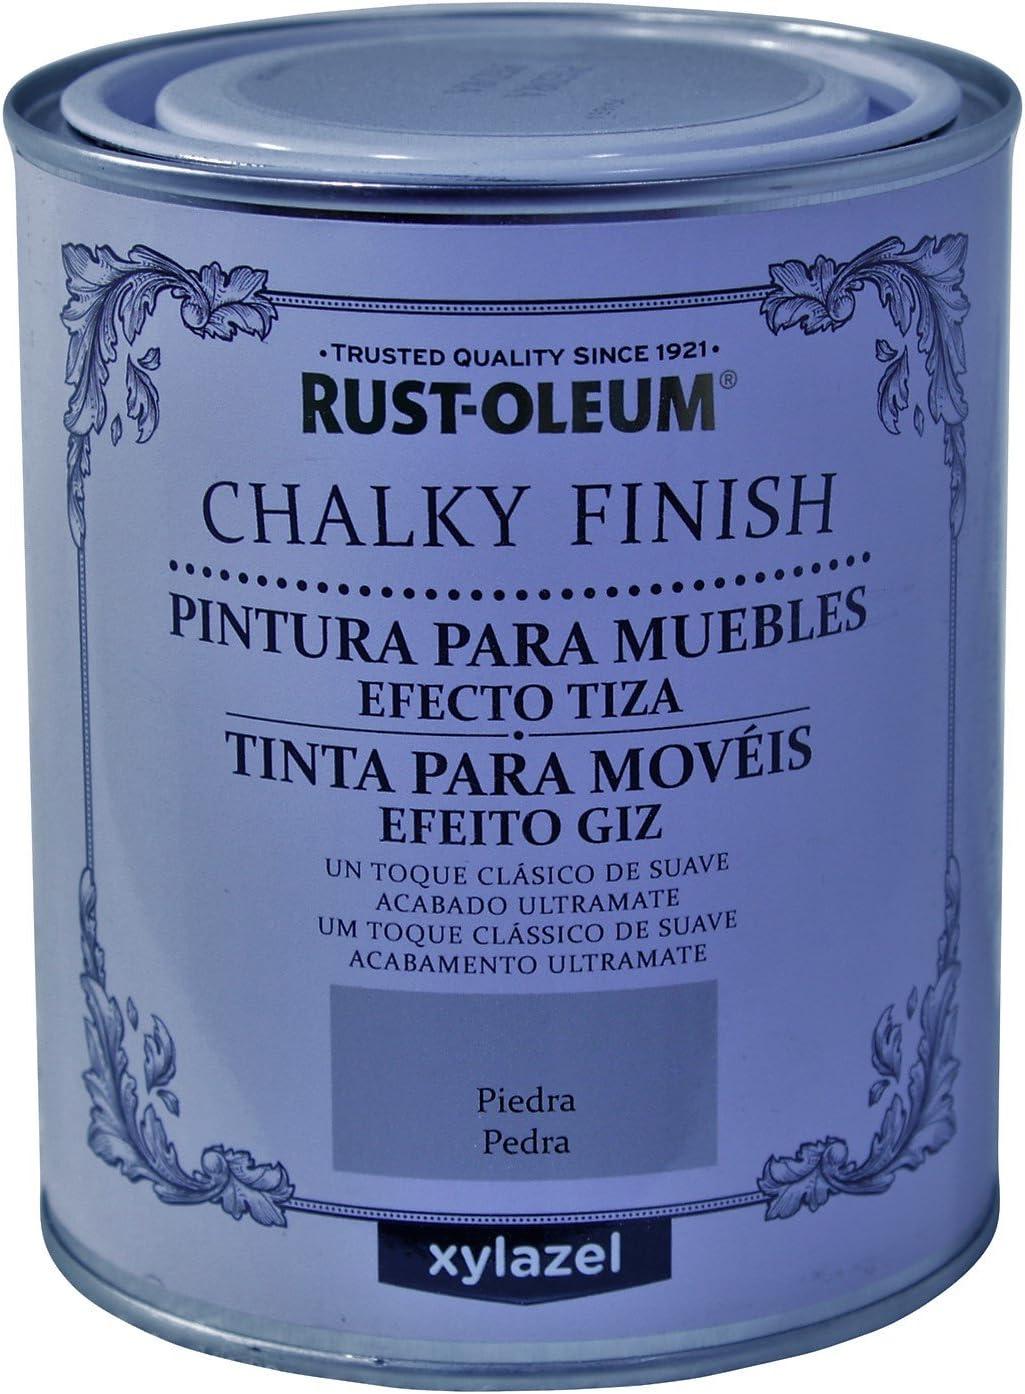 Rust-Oleum 4082203 Pintura, Piedra, 750 ml